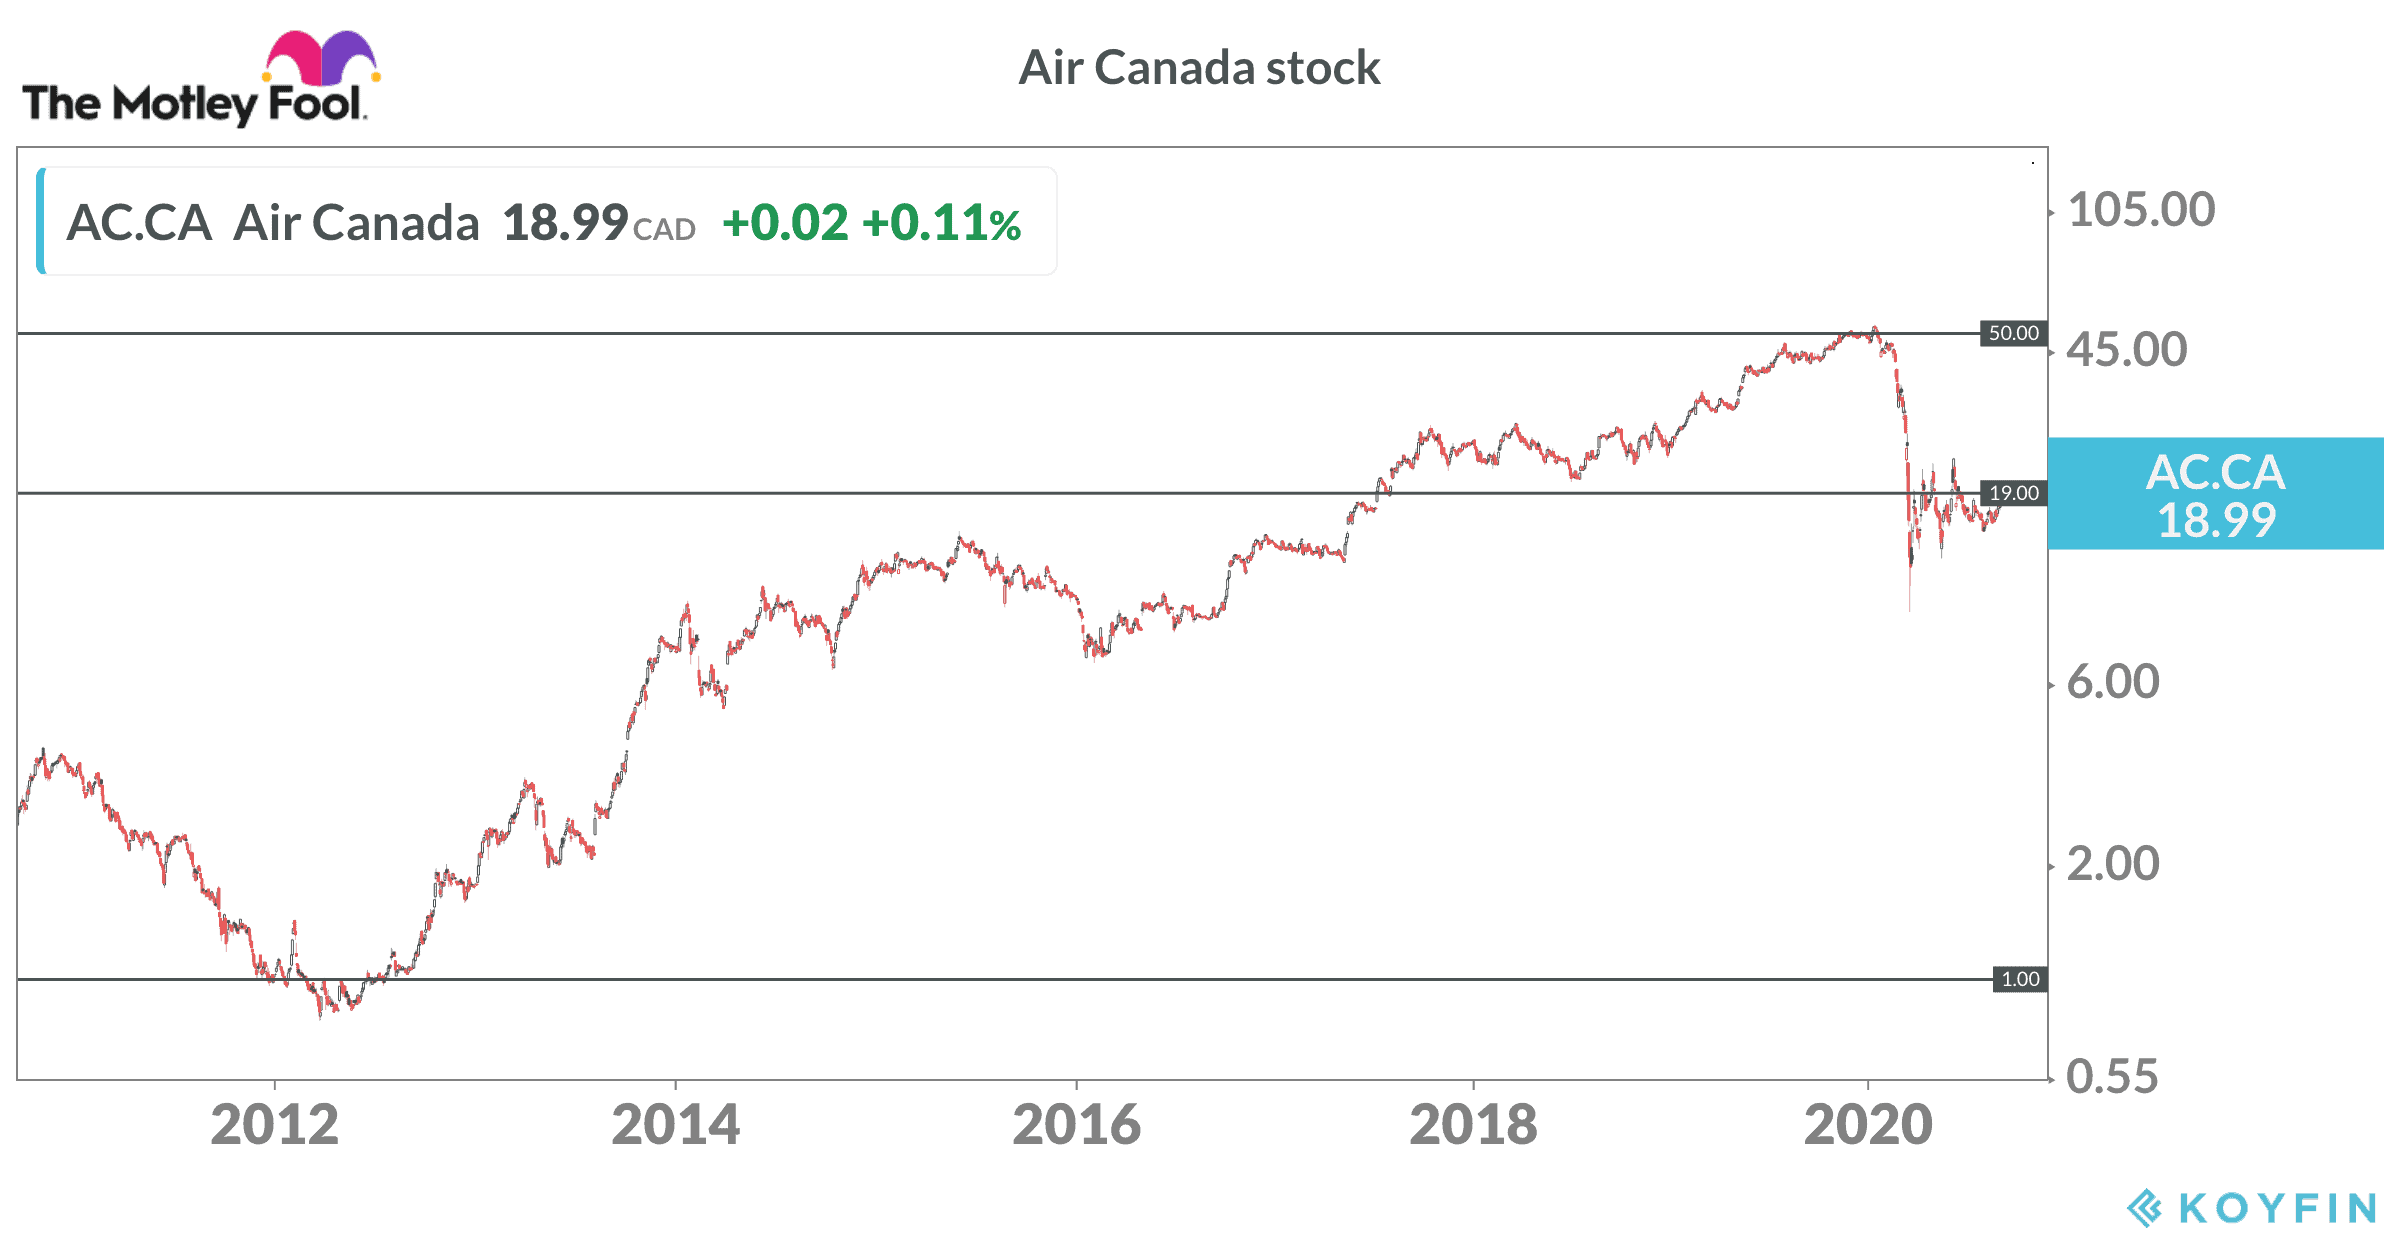 Air Canada stock